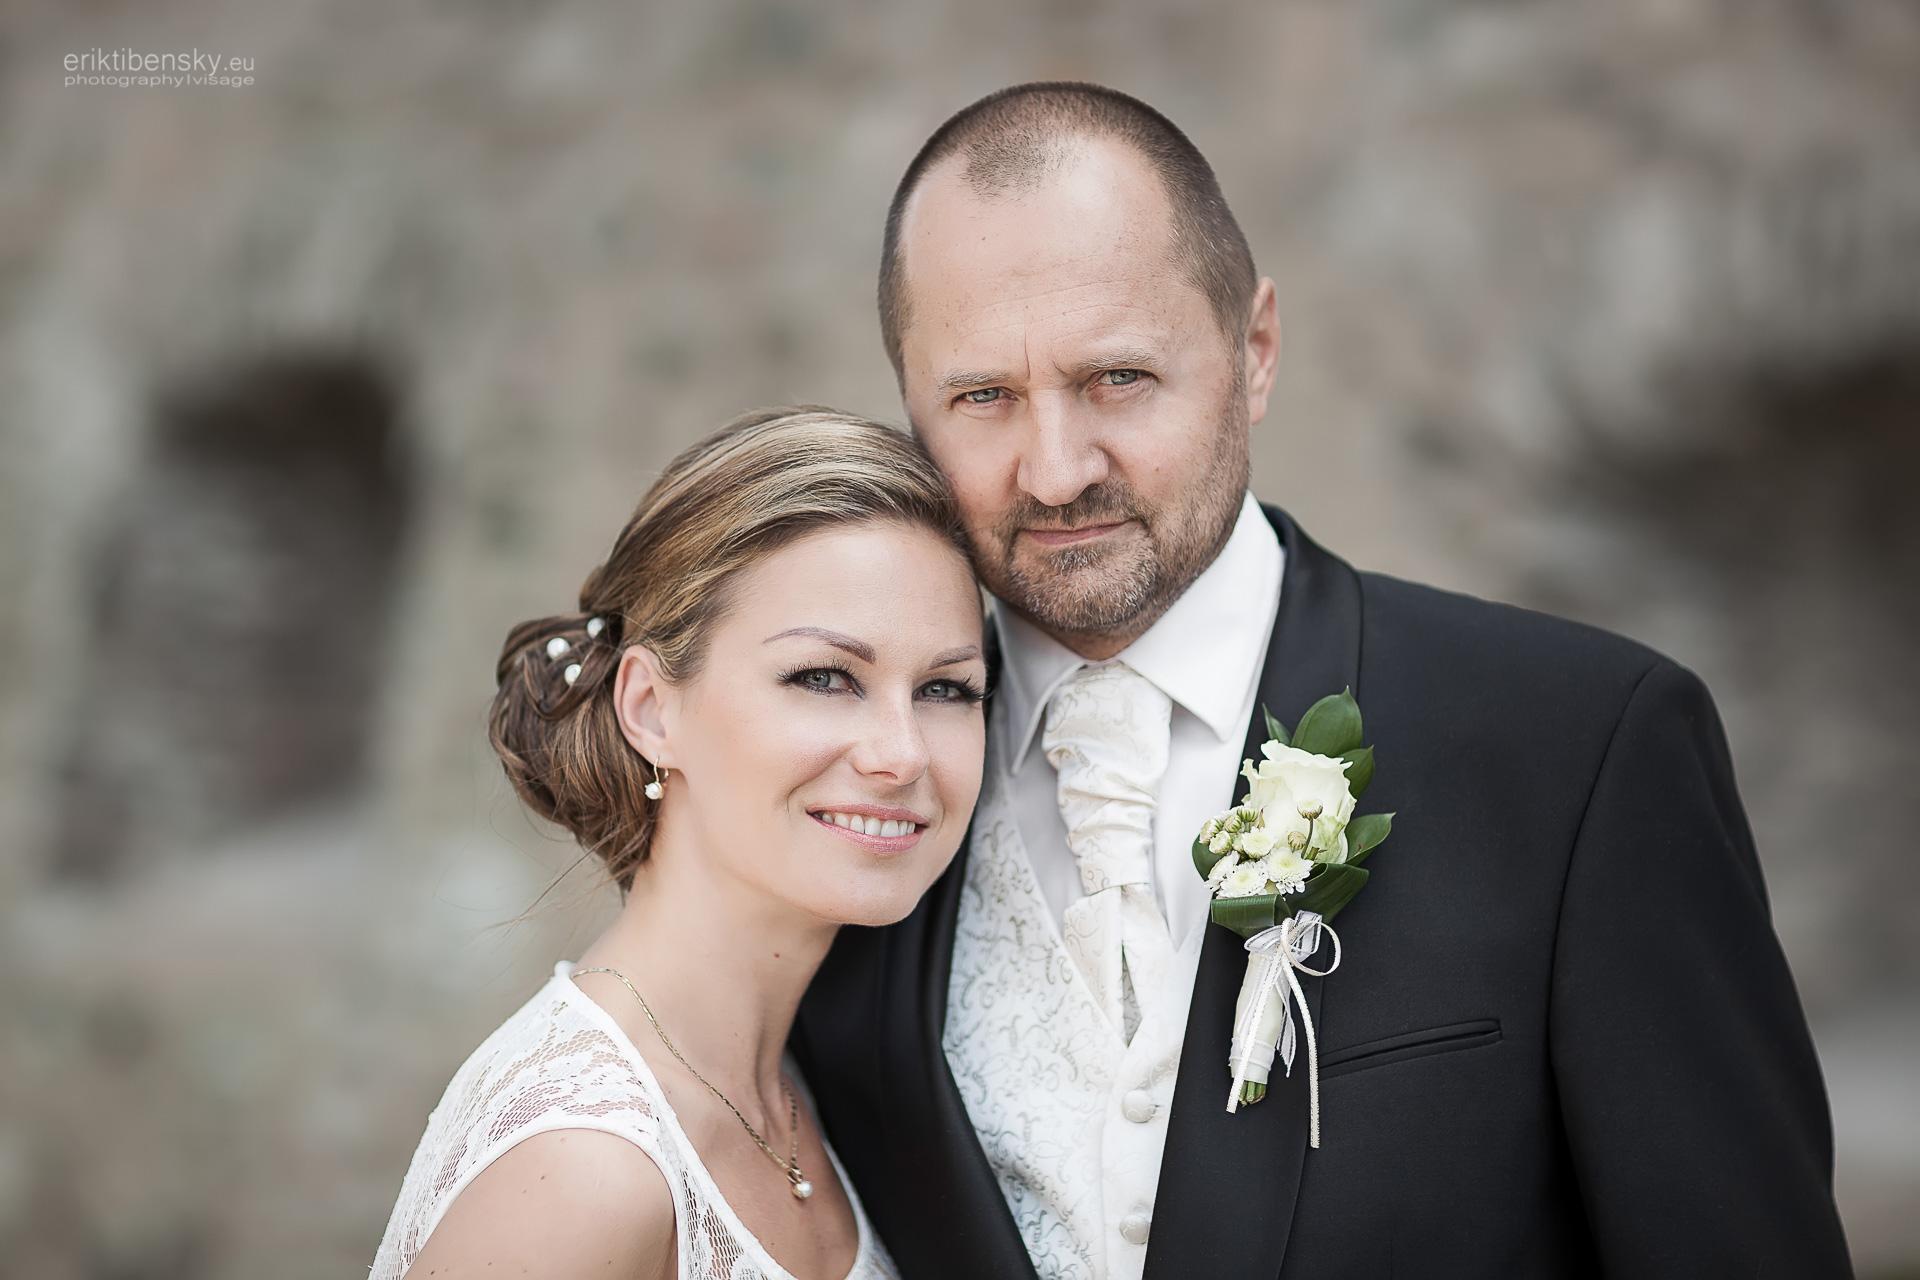 eriktibensky.eu-svadobny-fotograf-wedding-photographer-3003